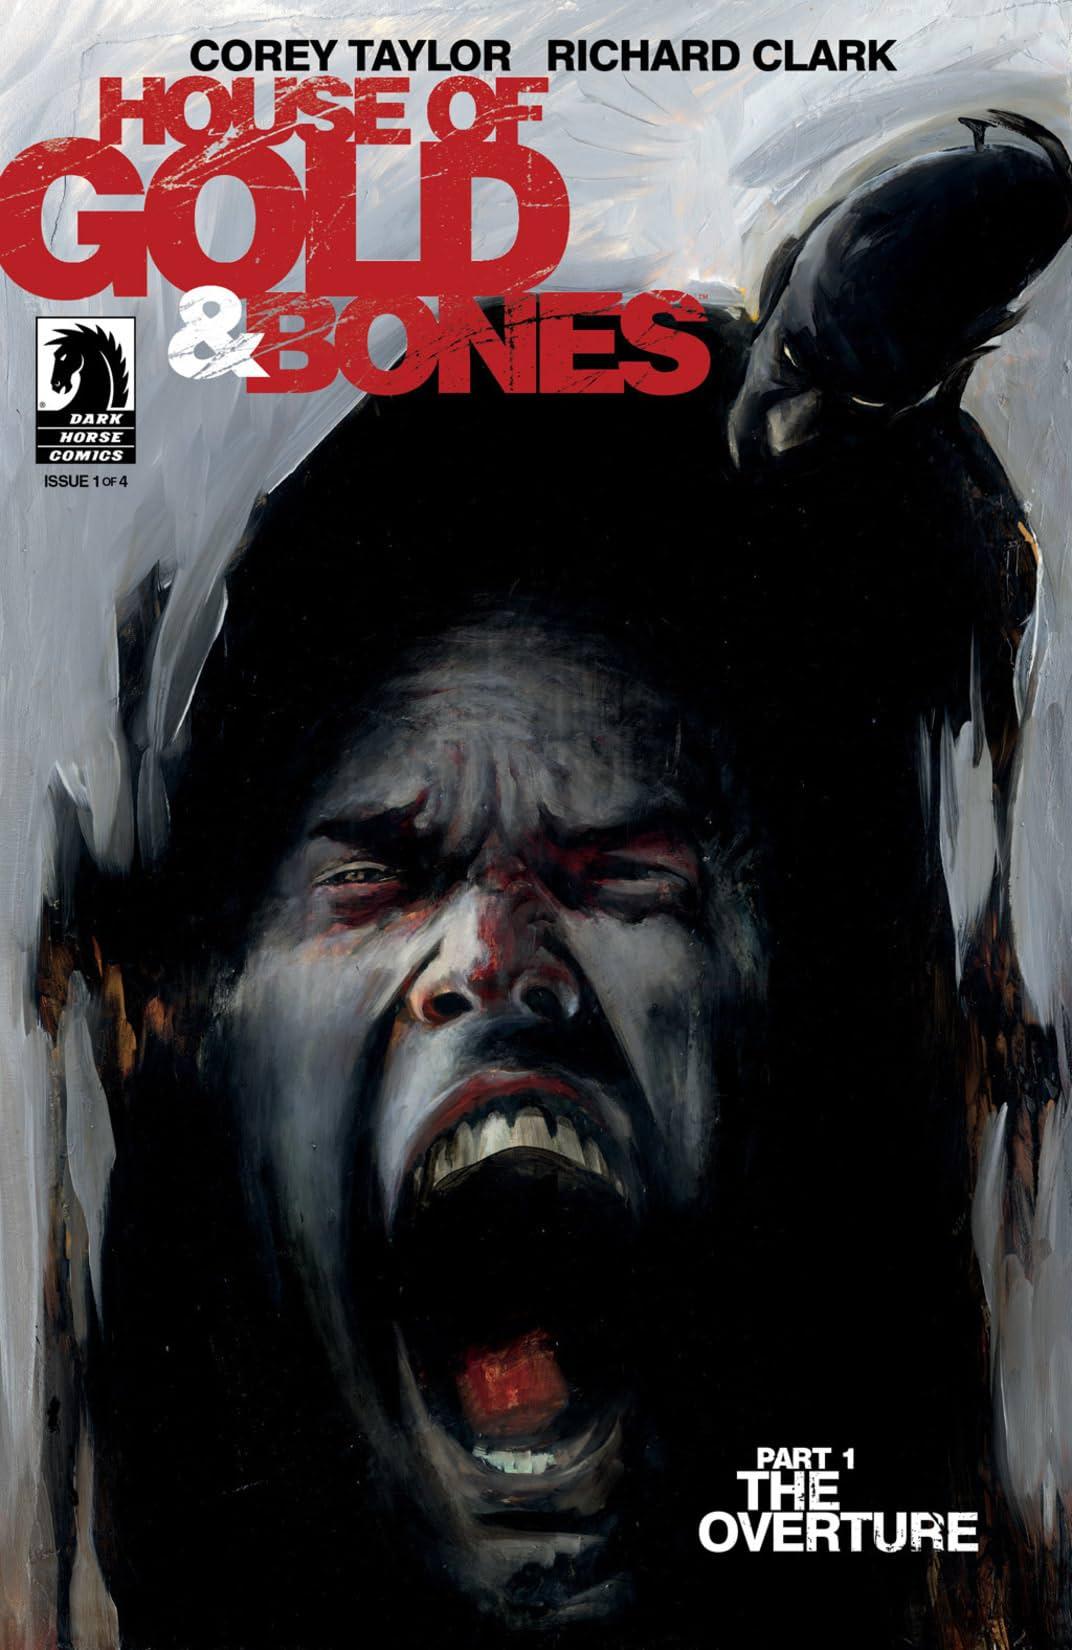 House of Gold & Bones #1